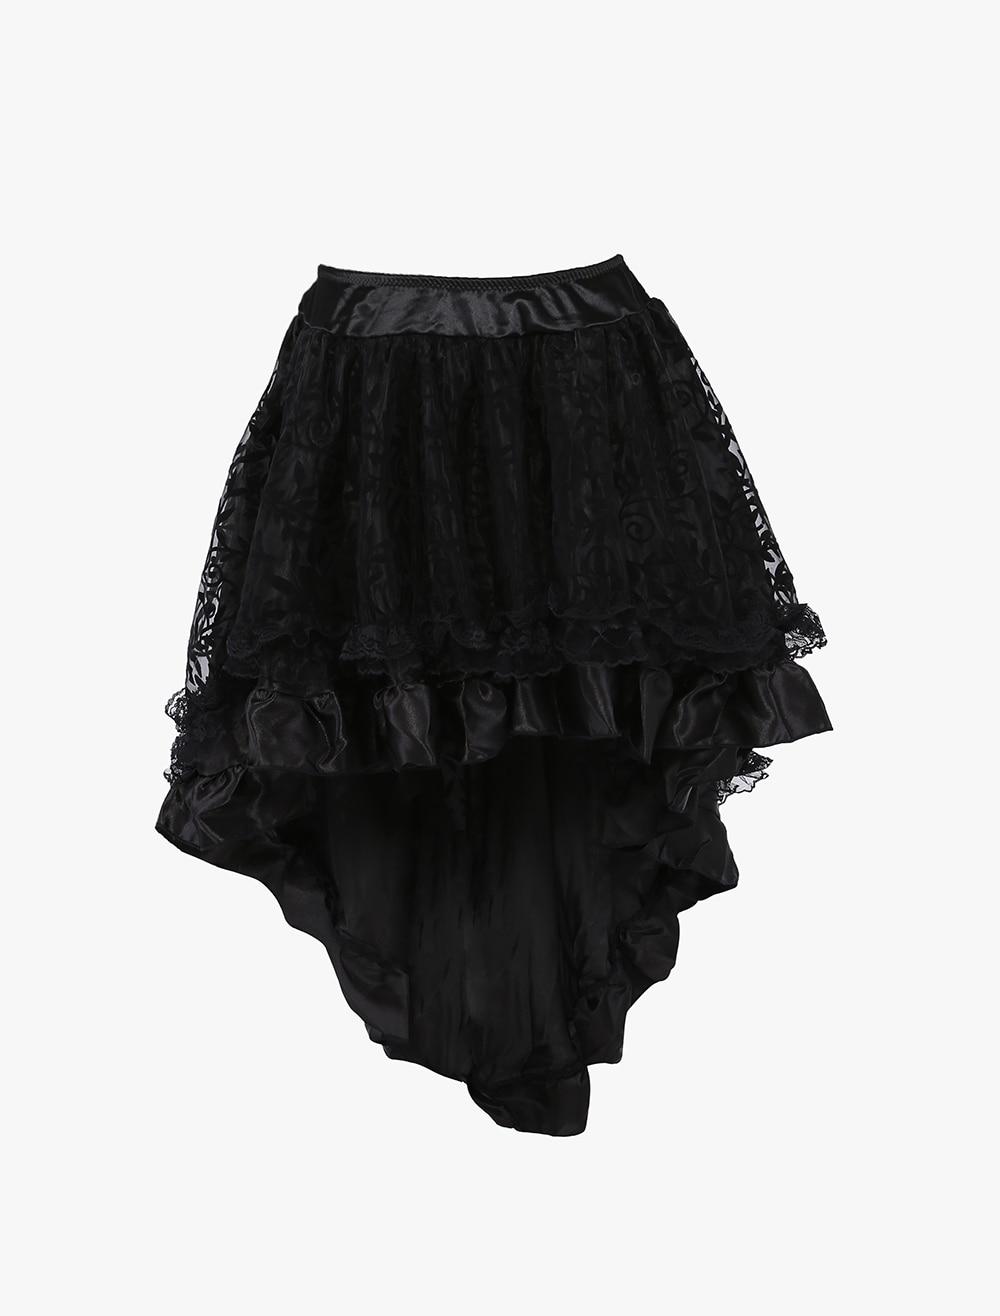 WK19 Lolita Tutu Saia Mini Shapers Skirt Black Lace Up Jupe High Low Skirt Tulle Corset Skirts Plus Size Women Clothing